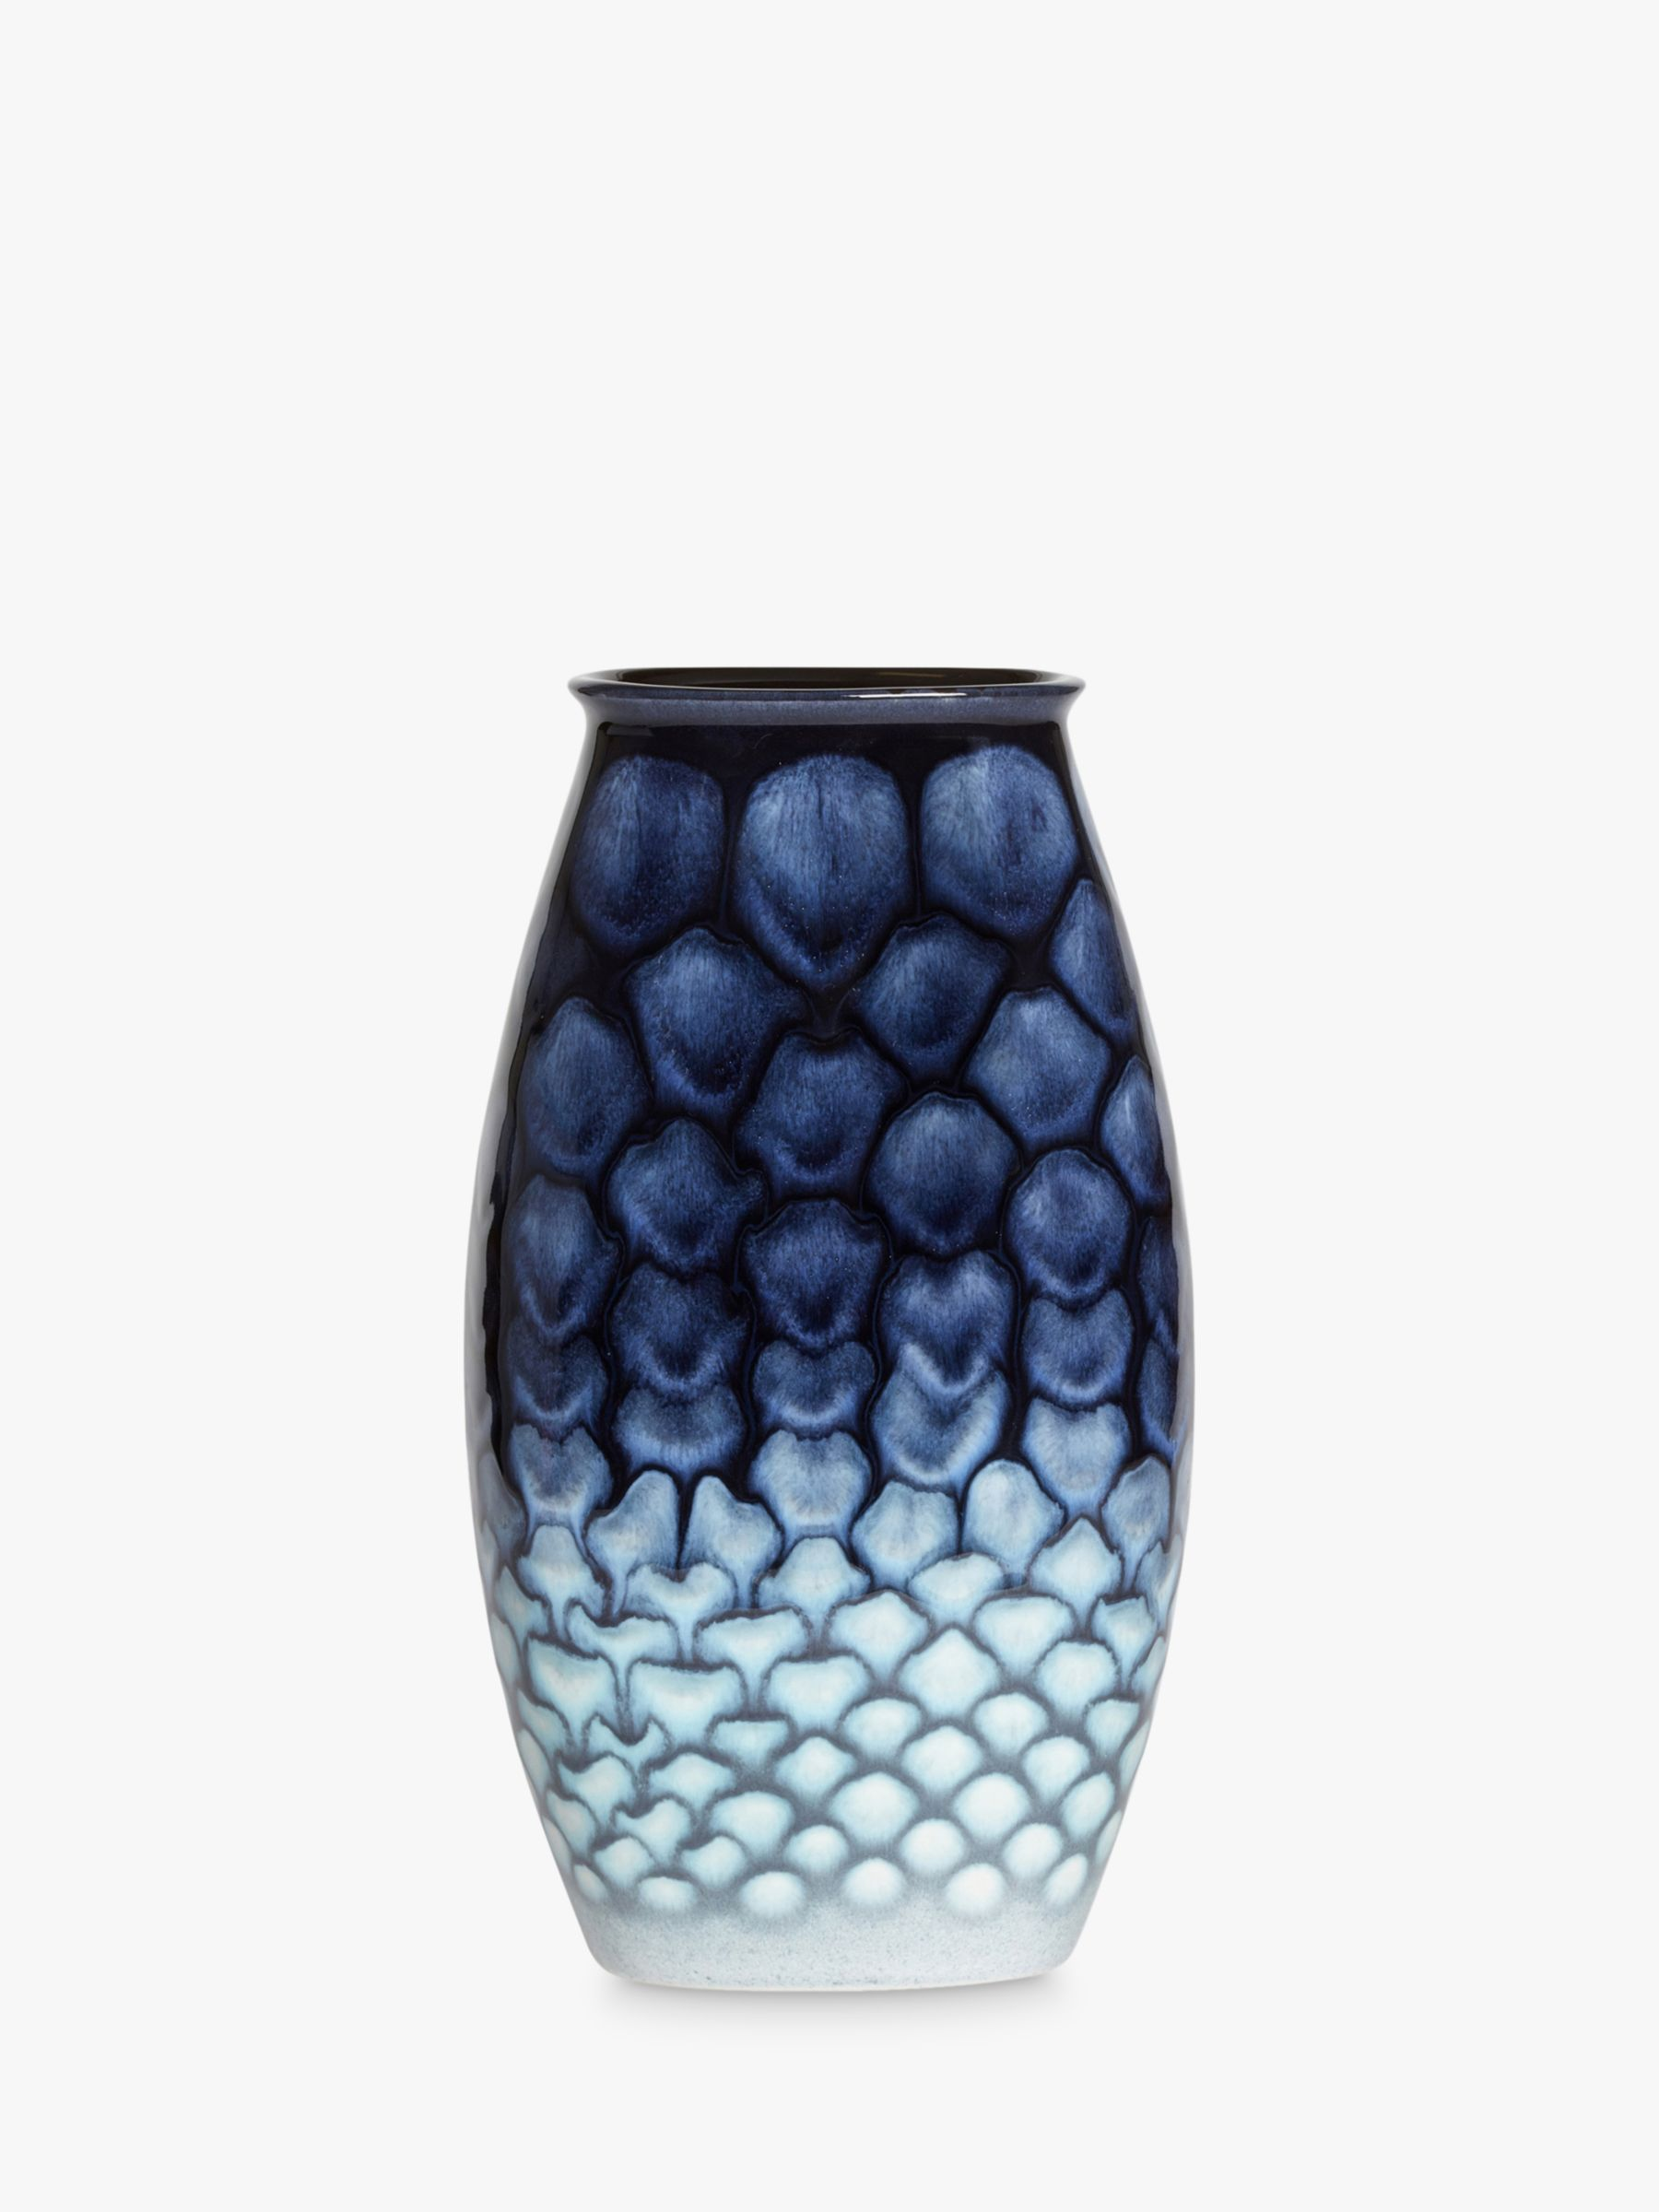 Poole Pottery Poole Pottery Ocean Manhattan Vase, H26cm